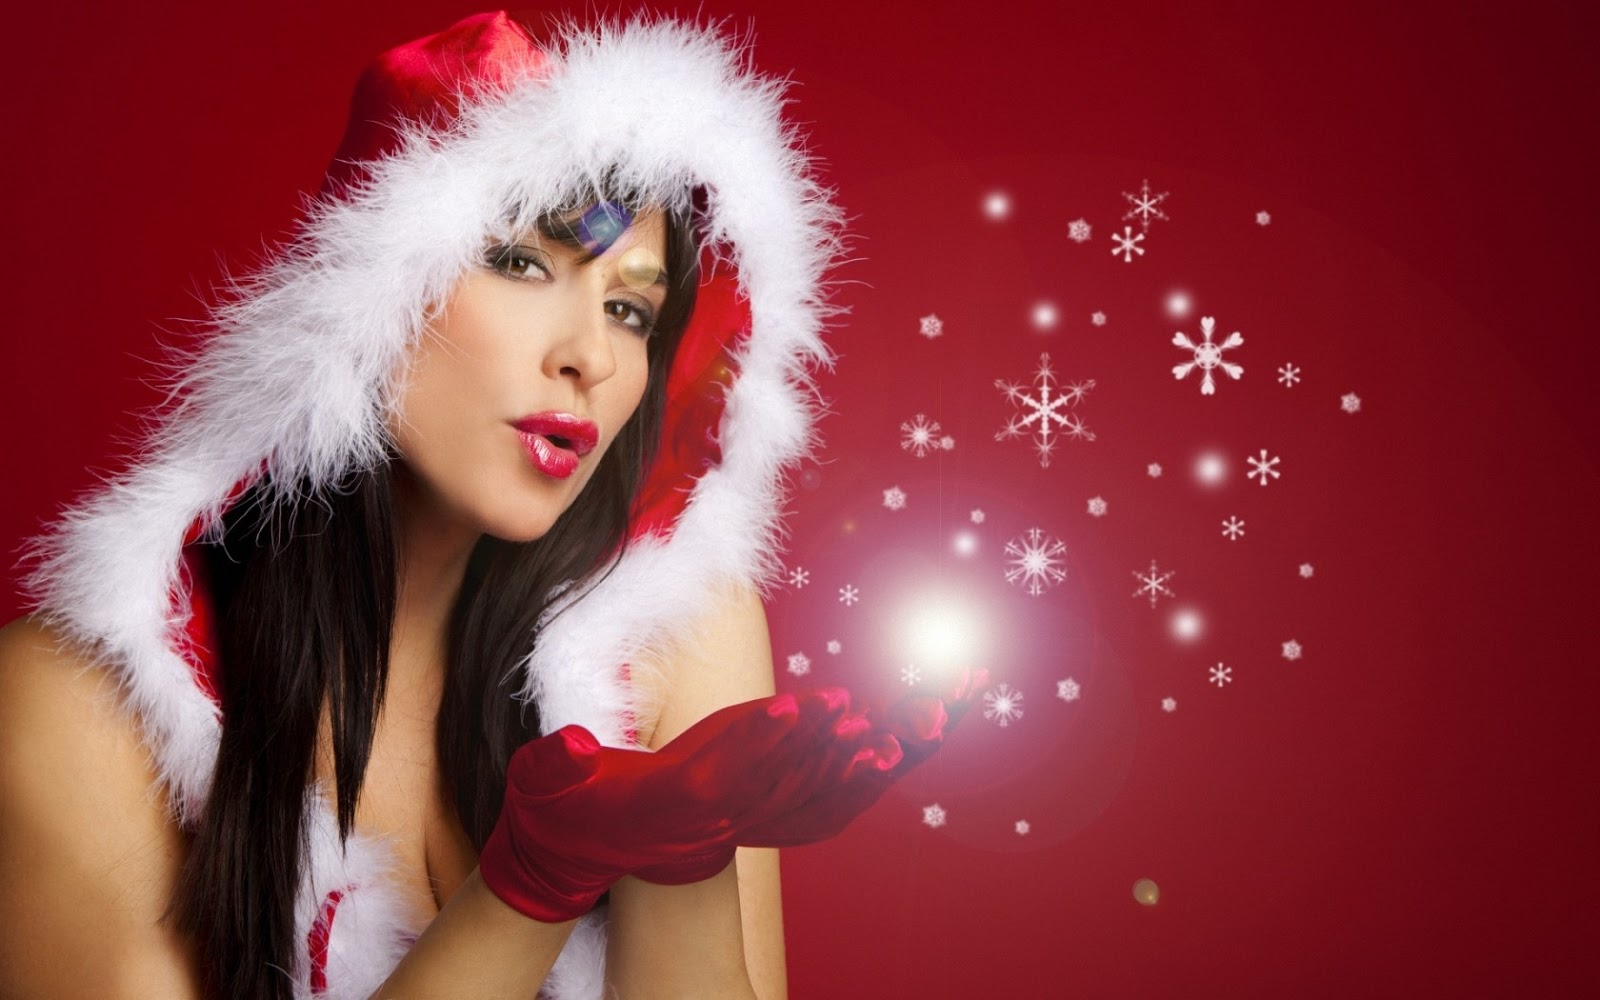 Christmas Girls Santa Claus Girls  - Beautiful Christmas Girl Desktop Background Hd